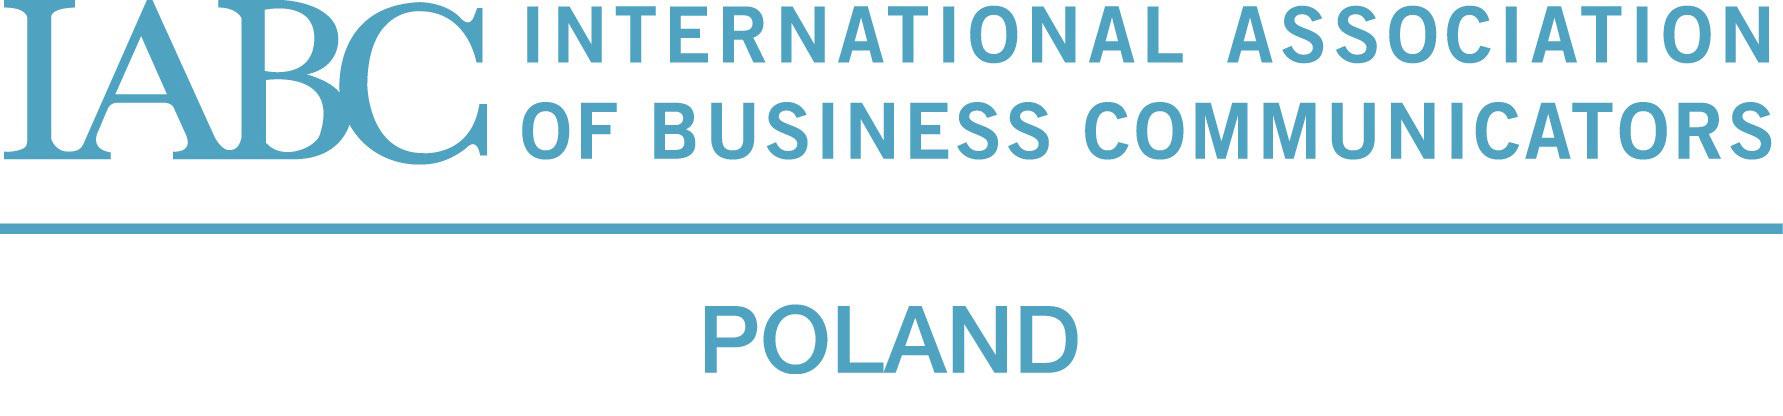 IABC/POLAND